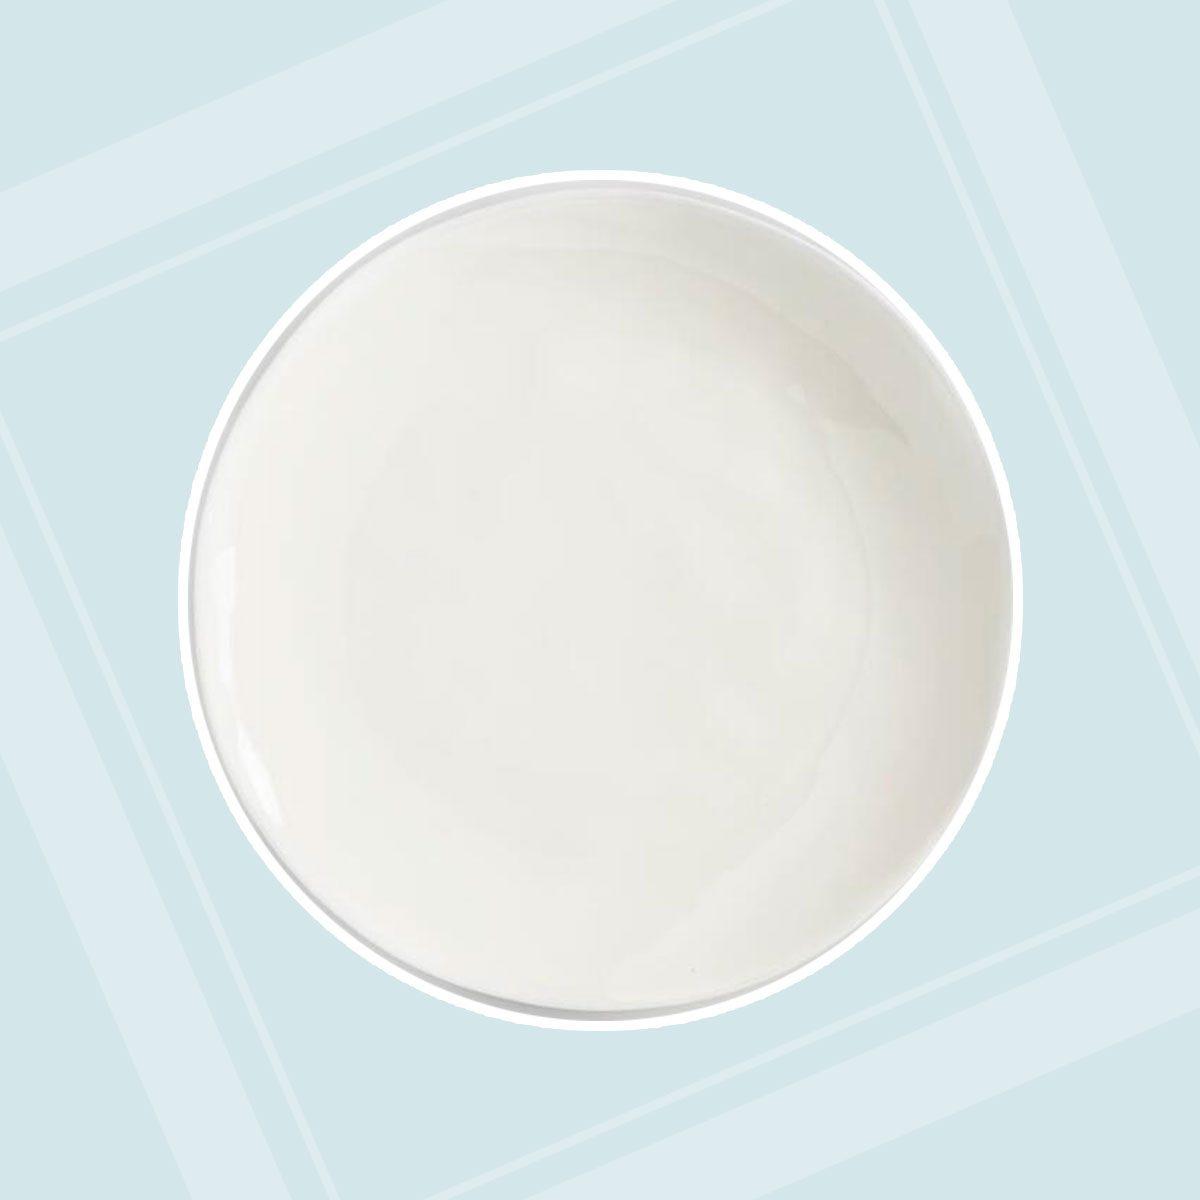 Ivory Salad Plates